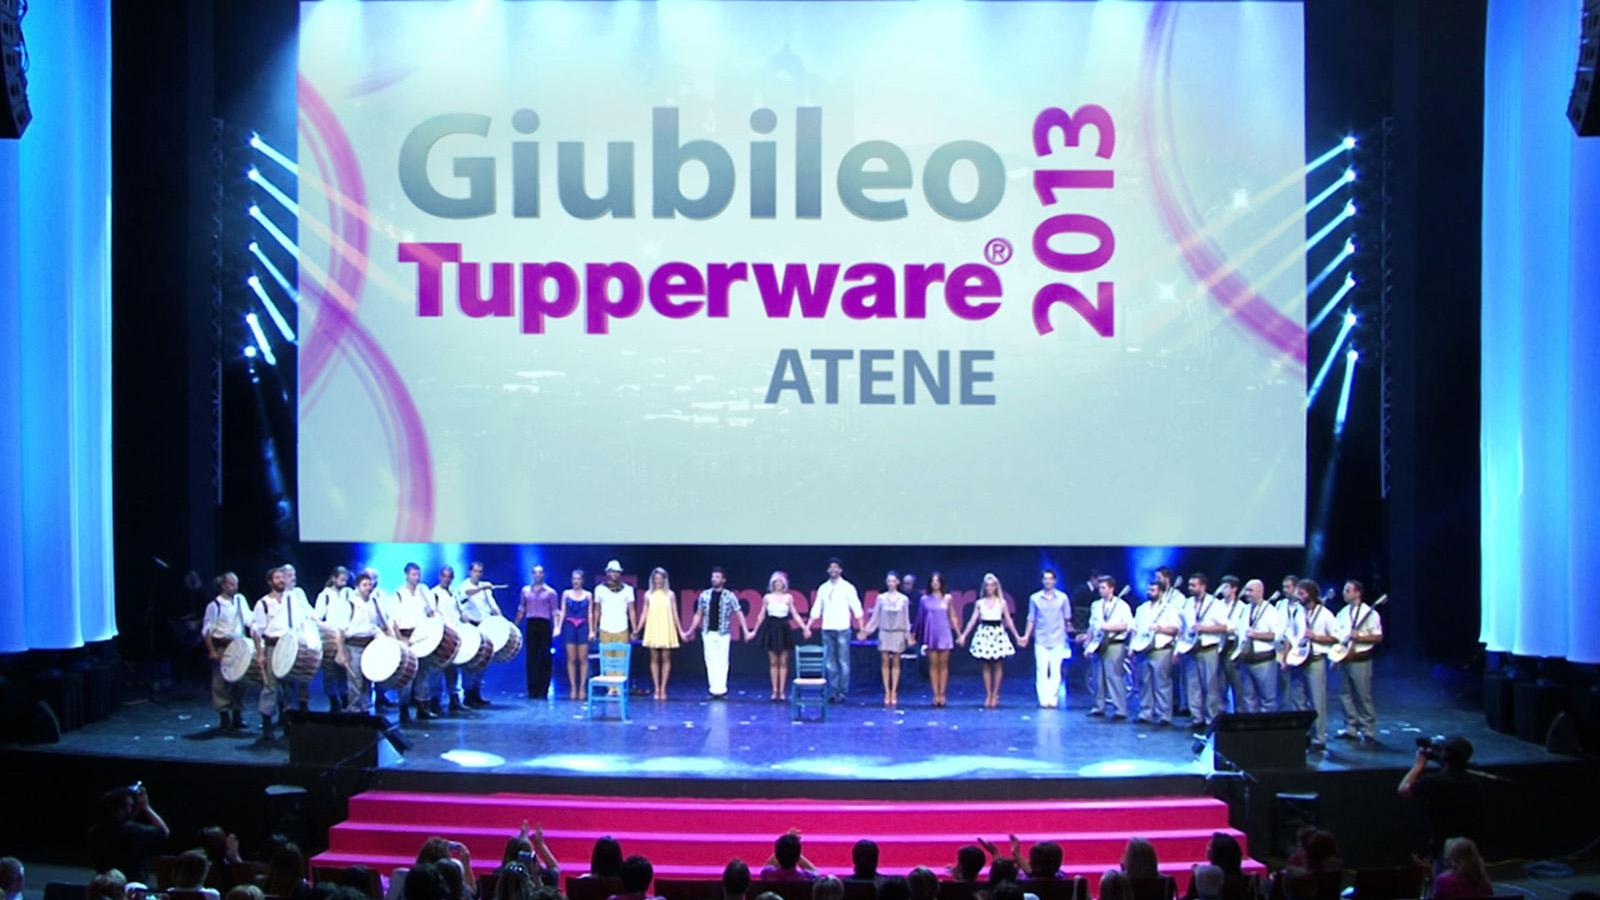 2013_TUPPERWARE_giubileo11